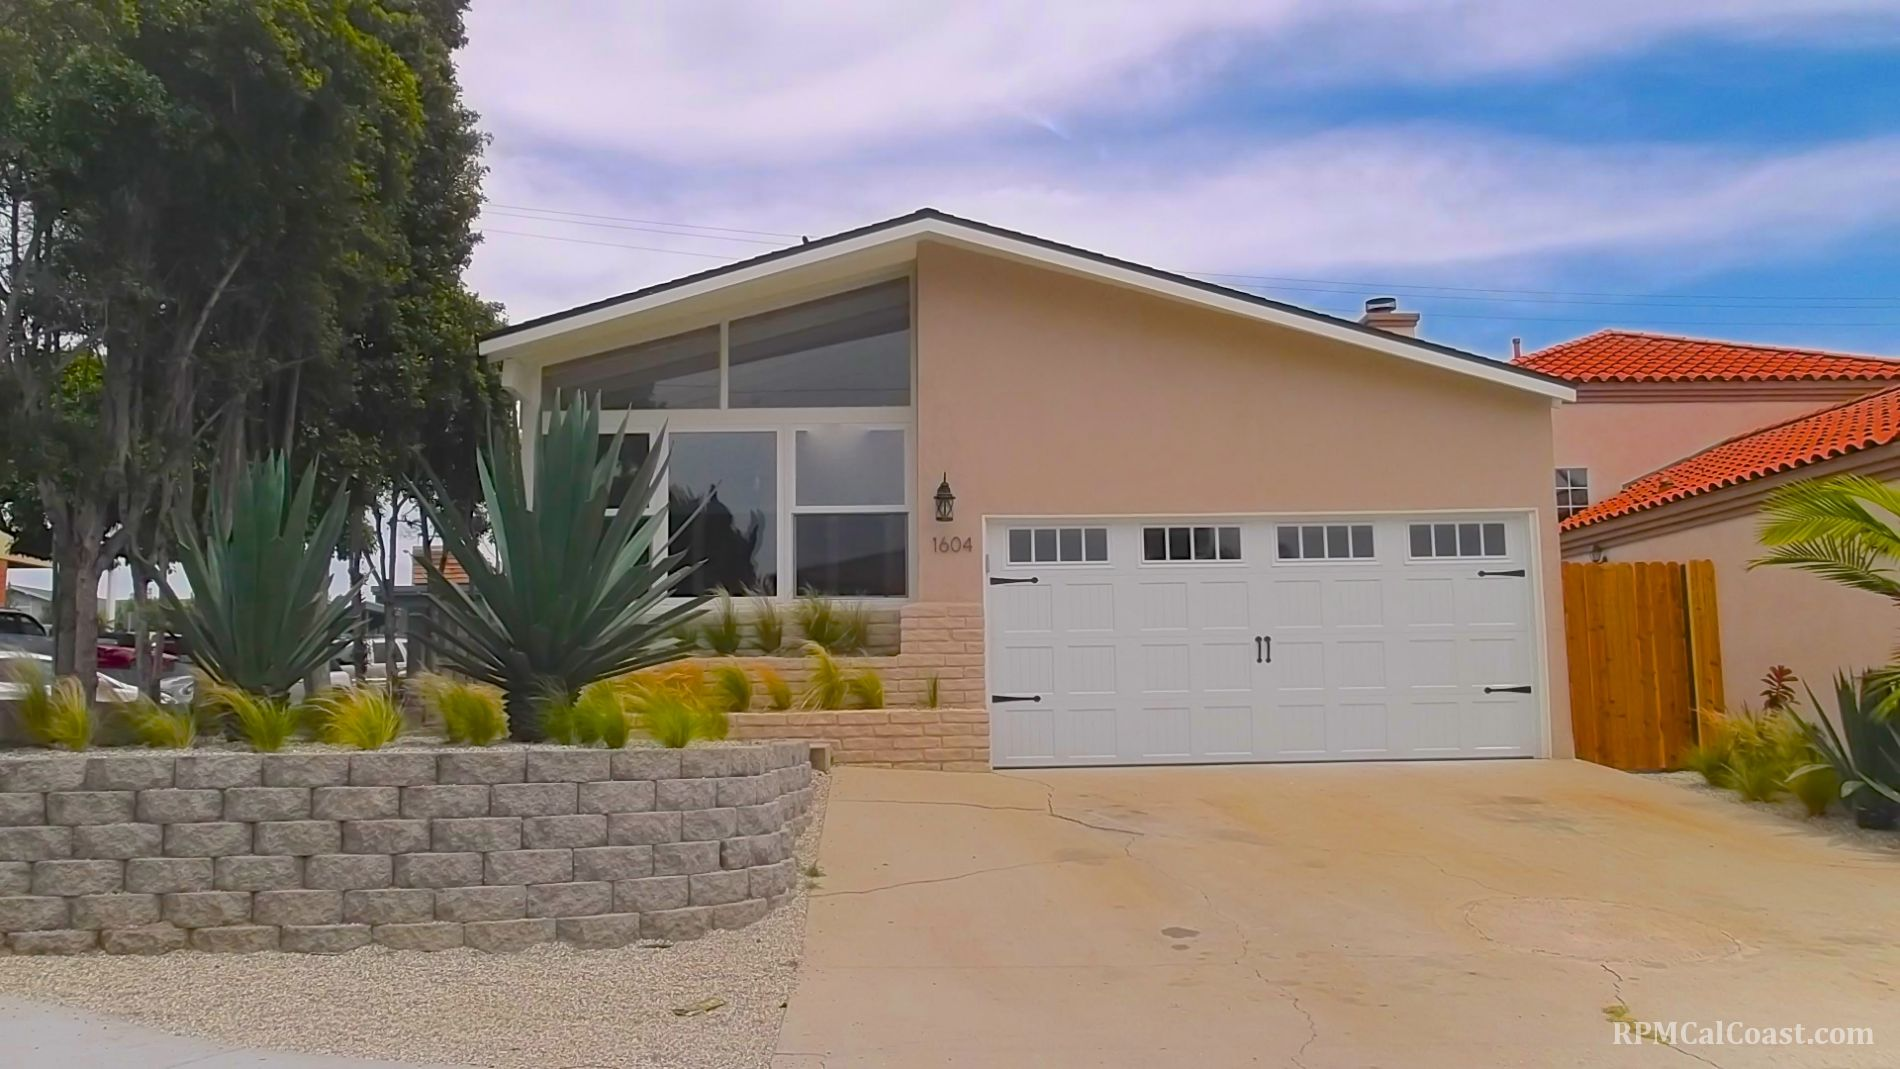 Manhattan Beach Home, CA Real Estate Listing